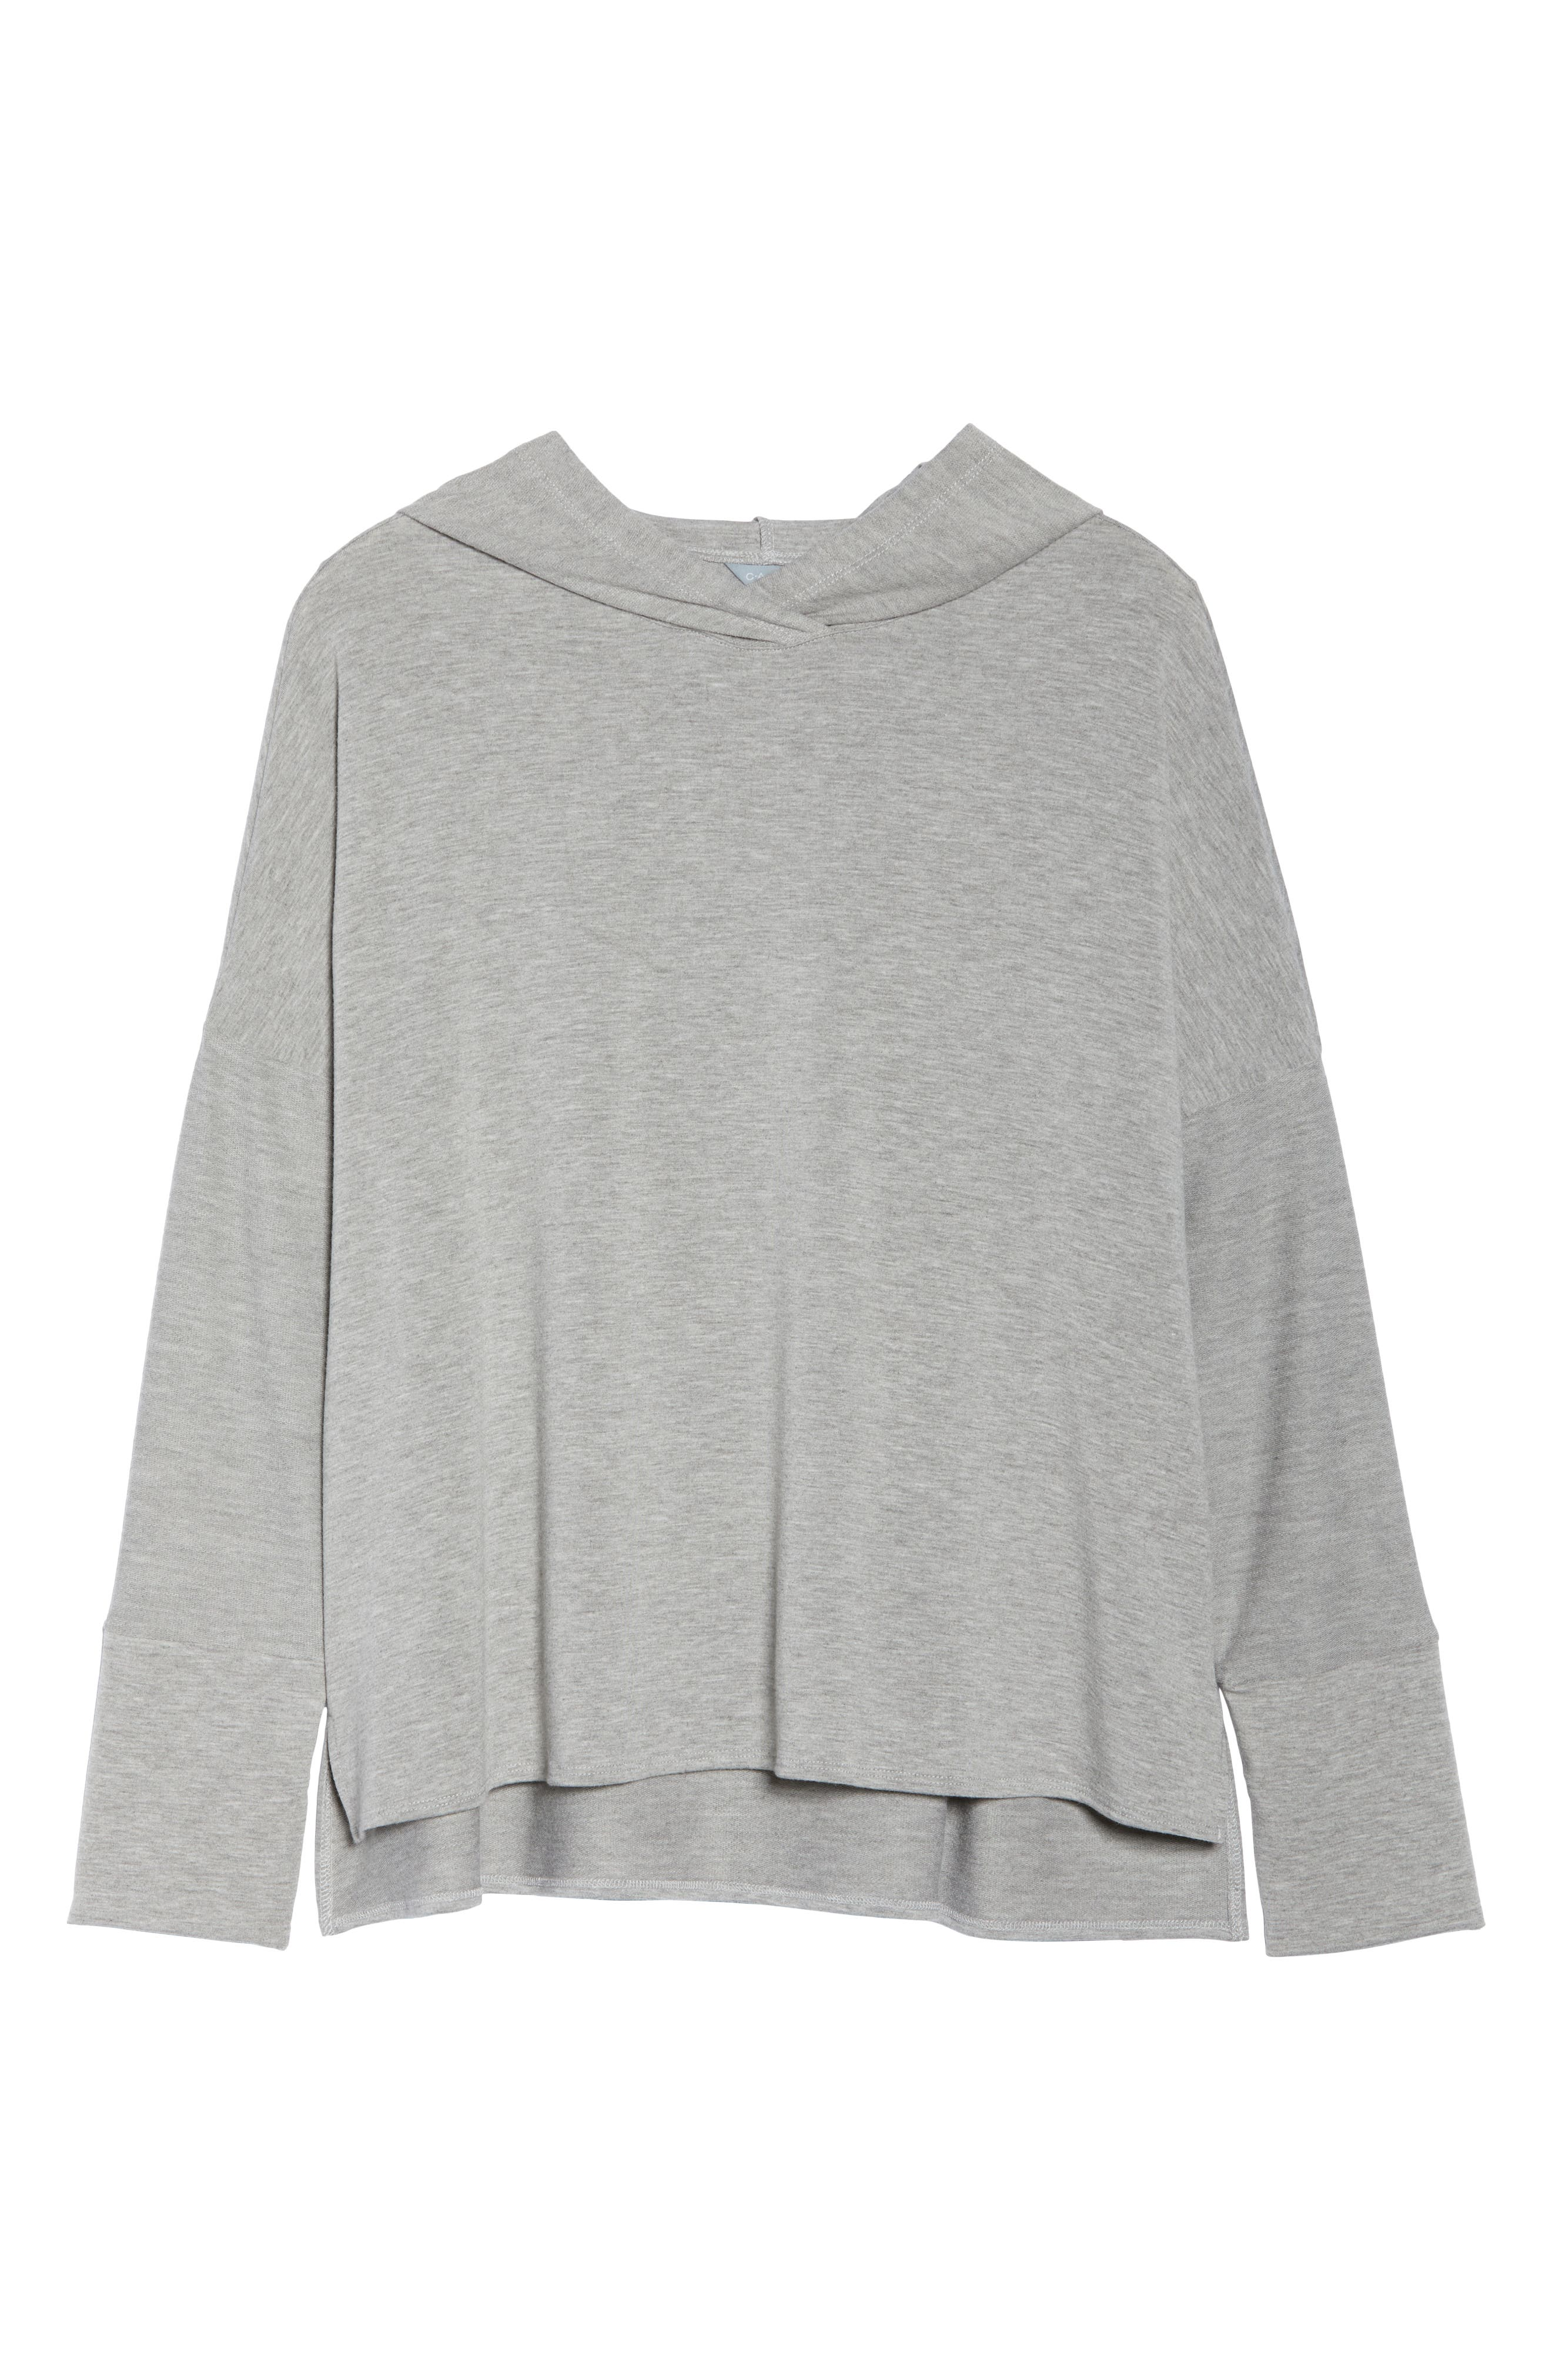 Off-Duty Hooded Sweatshirt,                             Alternate thumbnail 18, color,